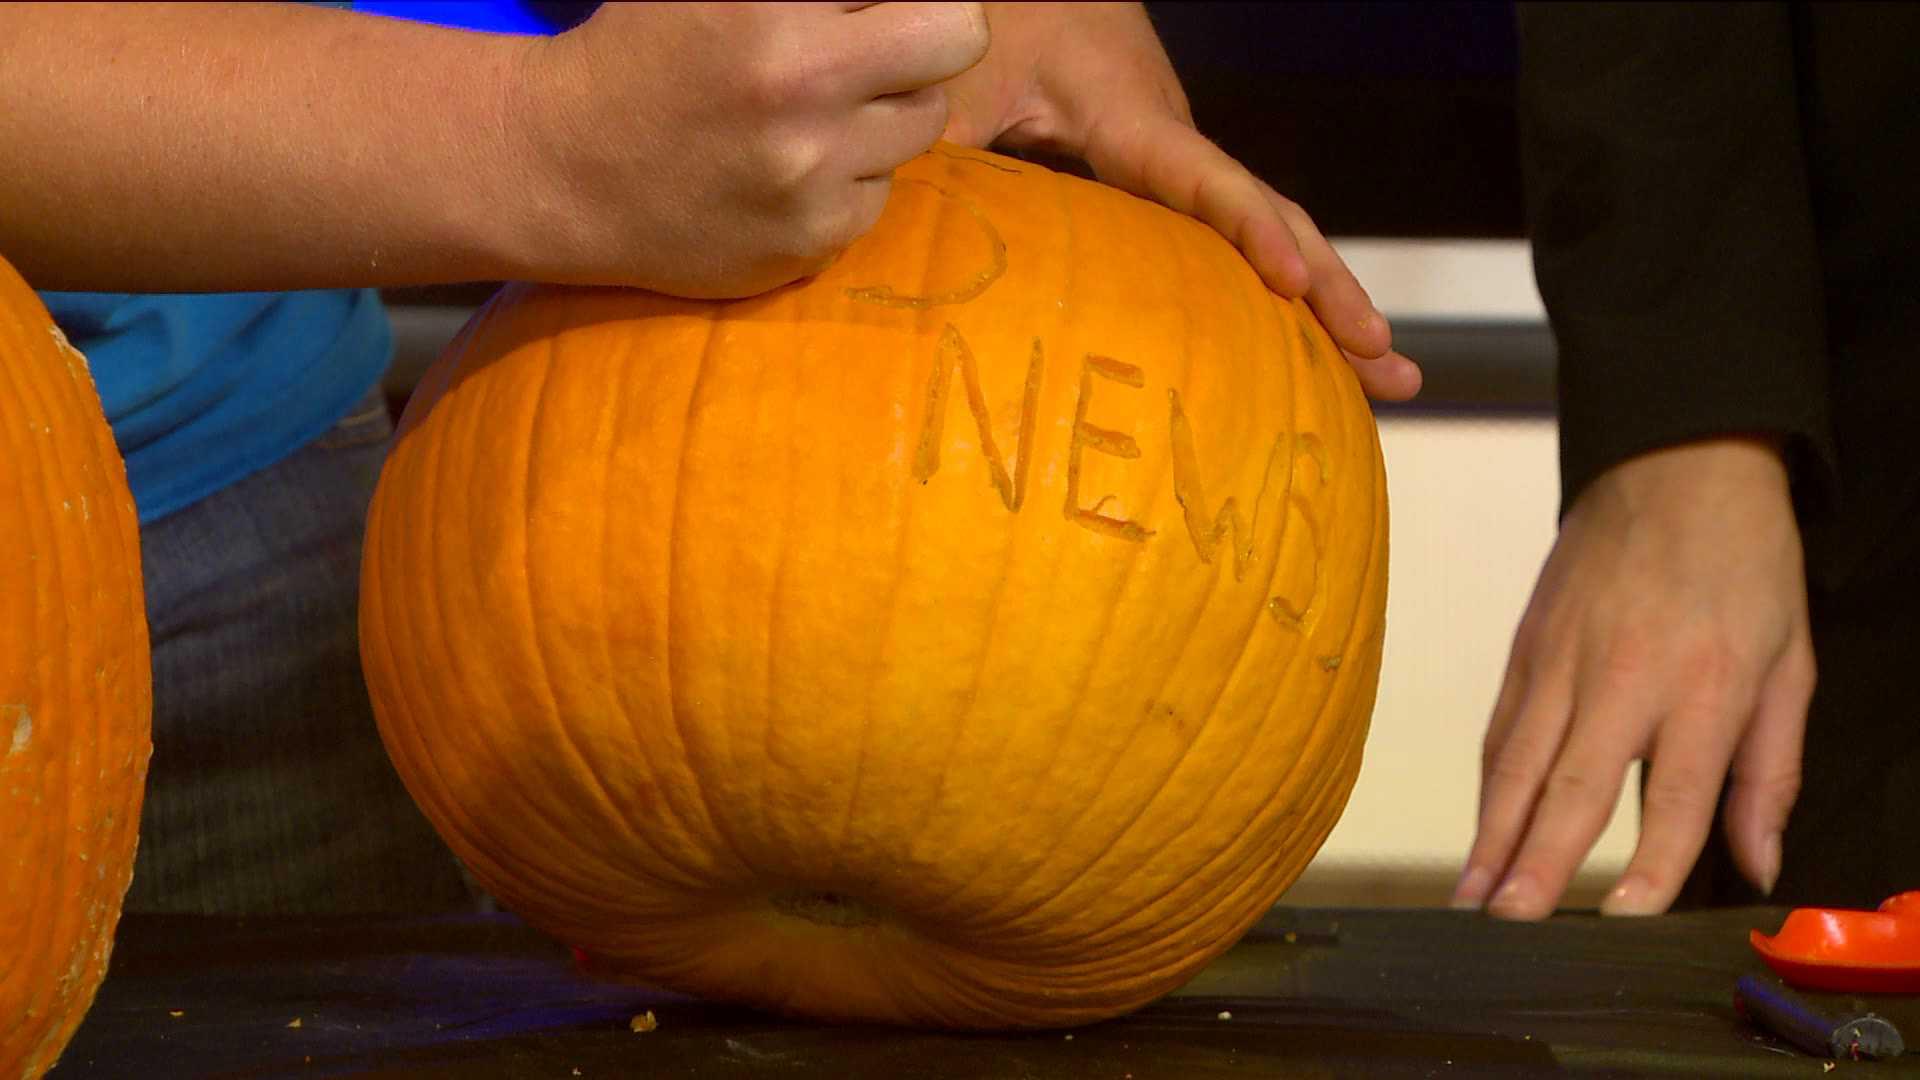 5NEWS gets its own special pumpkin.